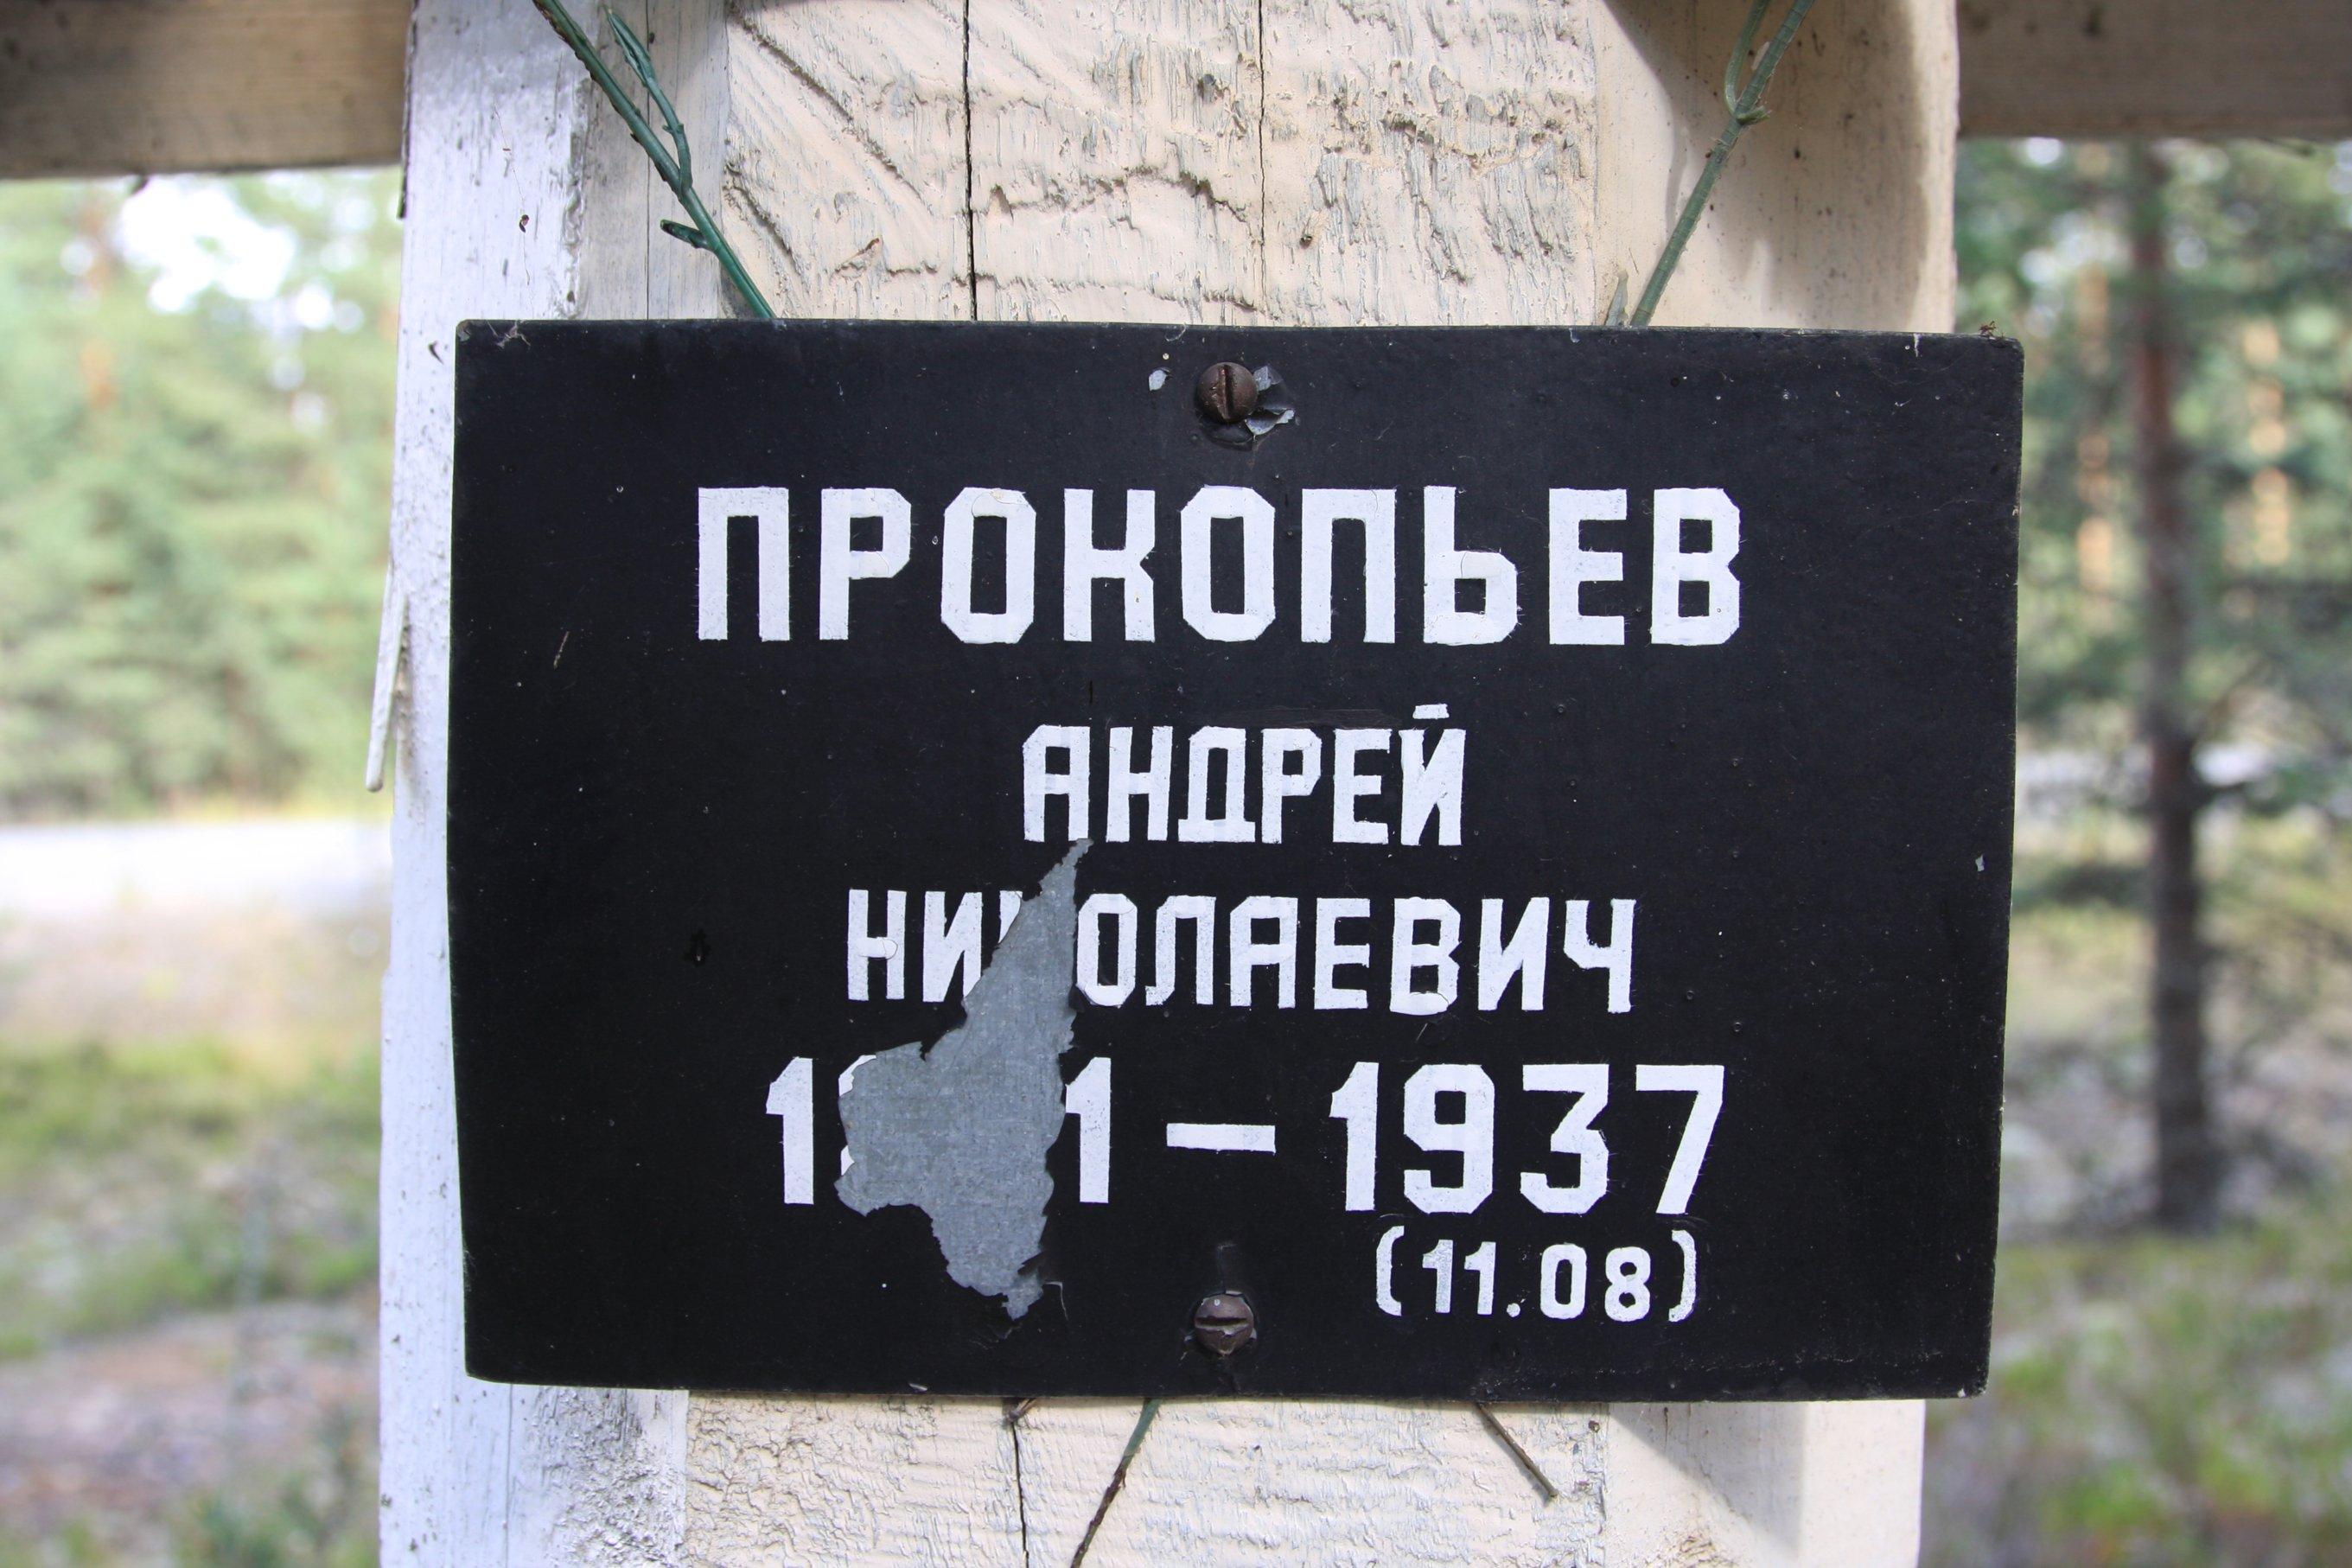 Памятная табличка «Прокопьев Андрей Николаевич». Фото 04.08.2018.